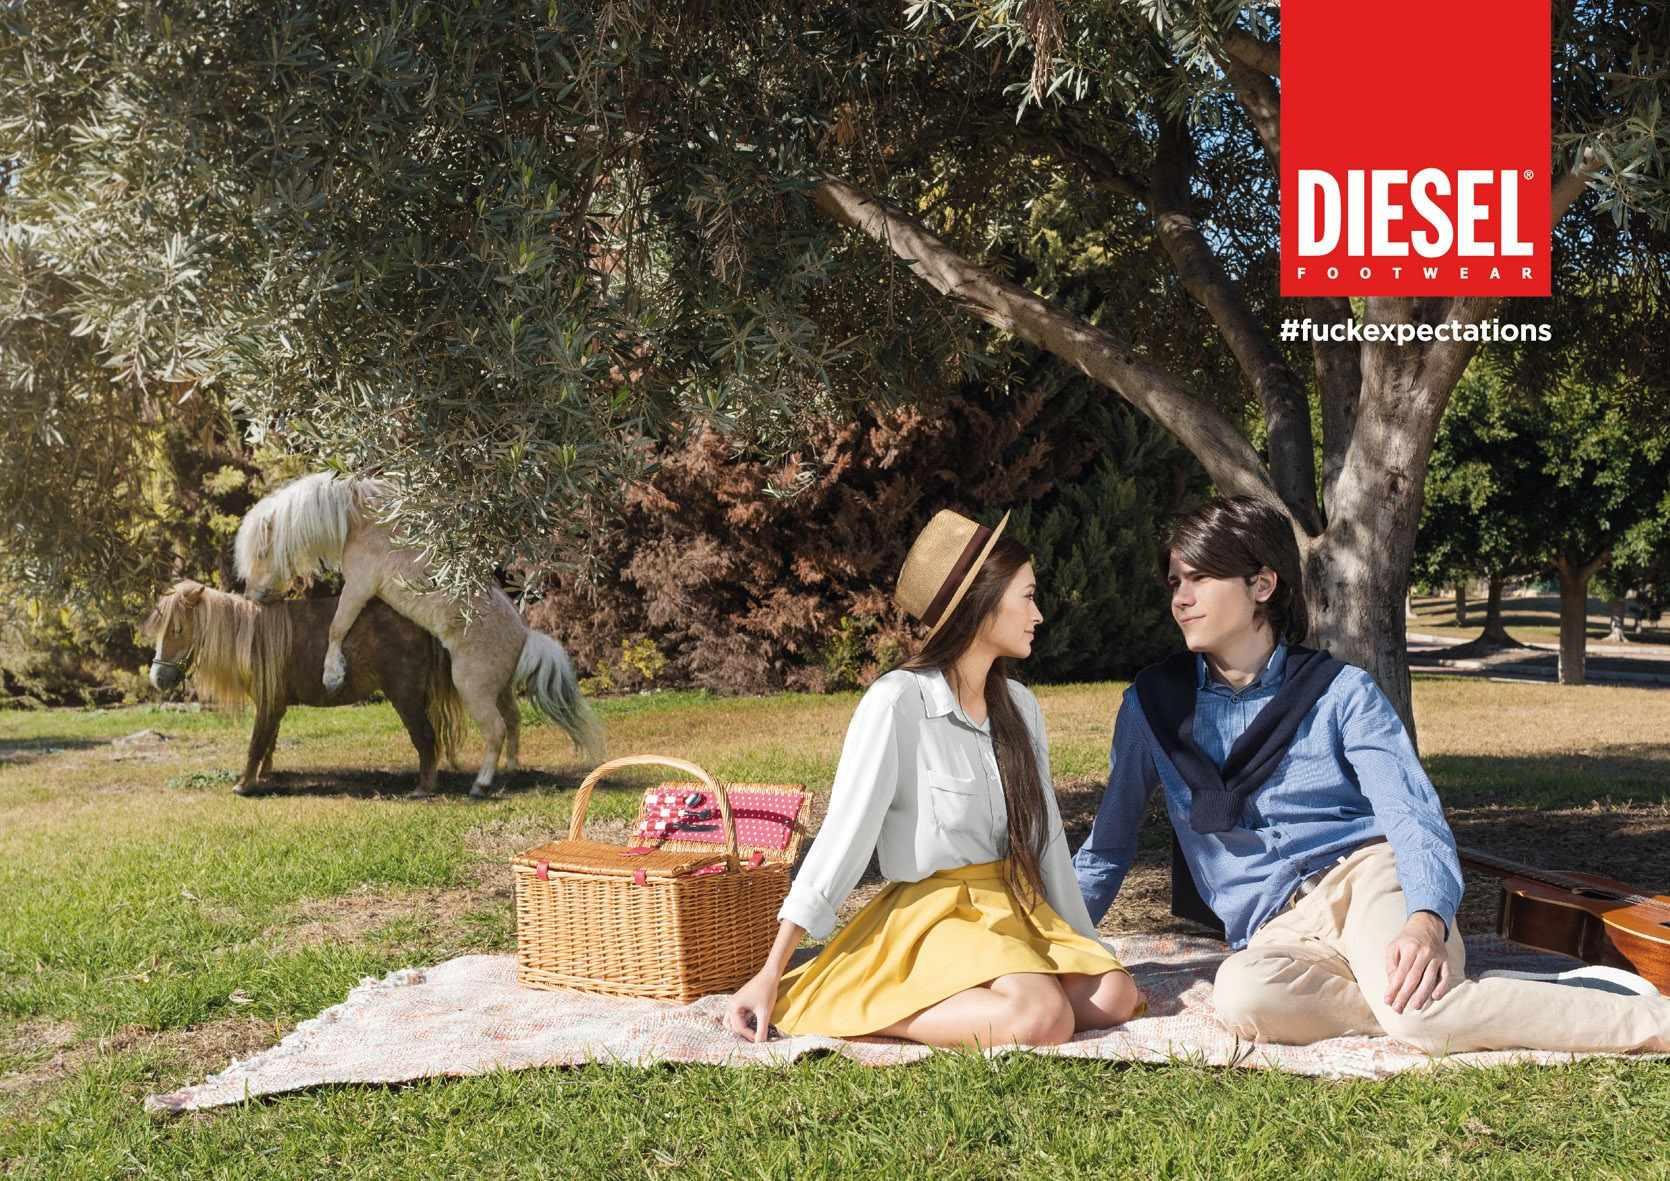 baja_dieselss15_picnic_h_aotw